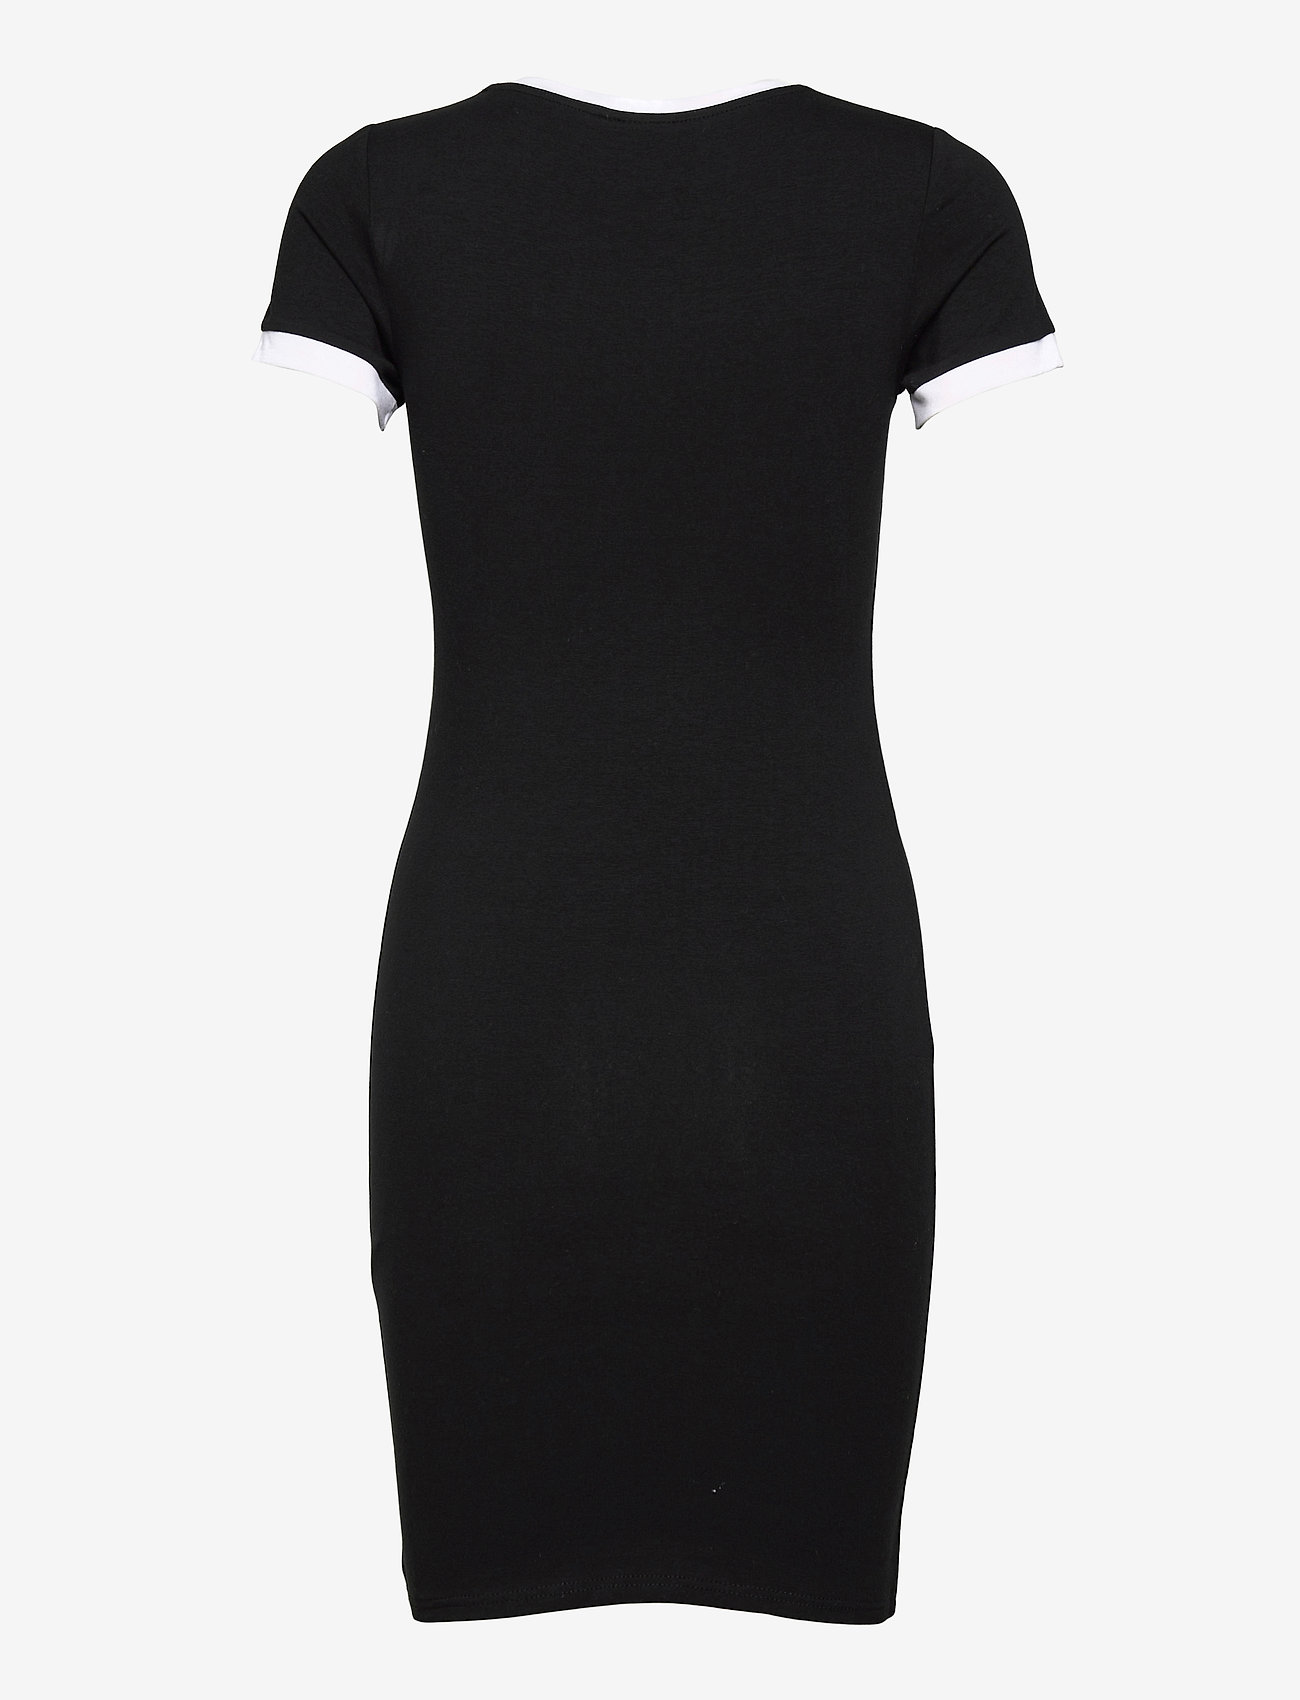 Ellesse - EL NINETTA DRESS - summer dresses - black - 1